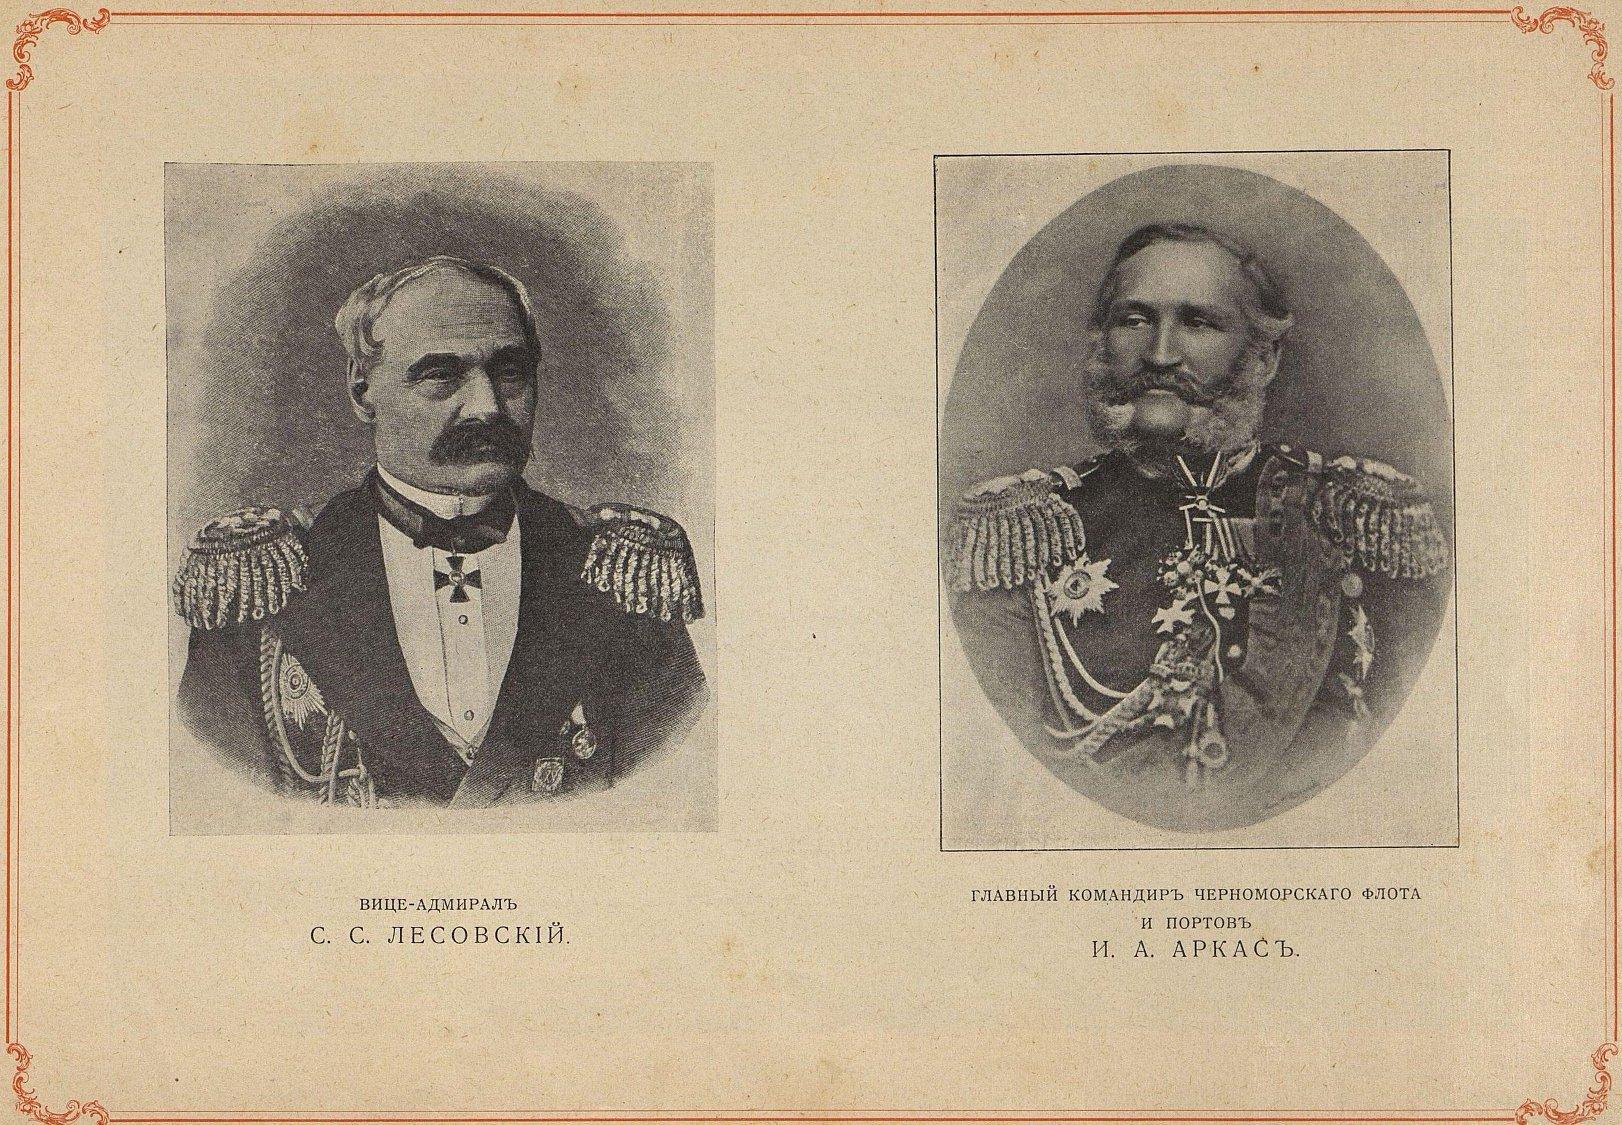 Портреты вице-адмирала С.С. Лисовского и И.А. Аркаса